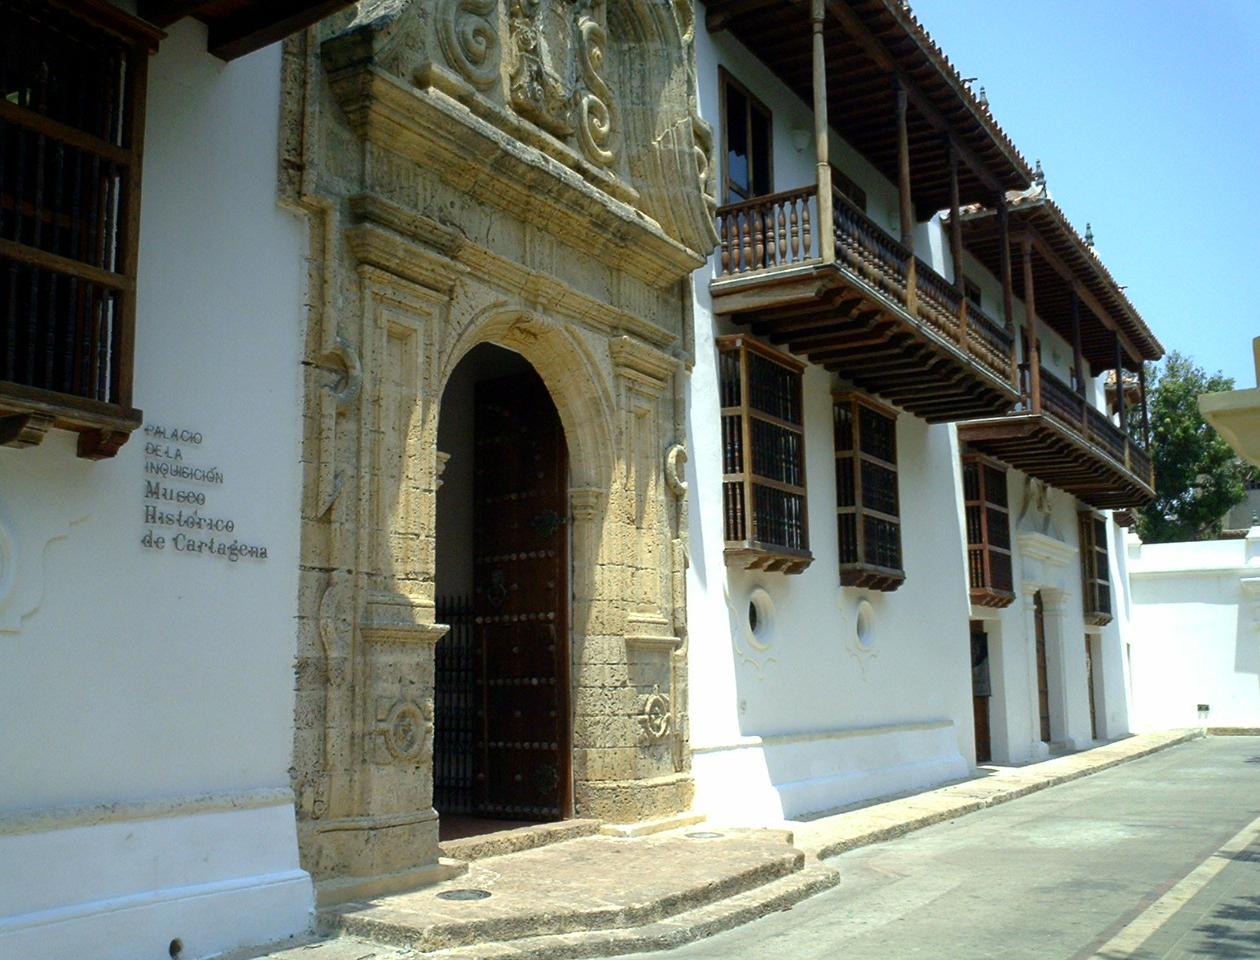 Inquisition Palace